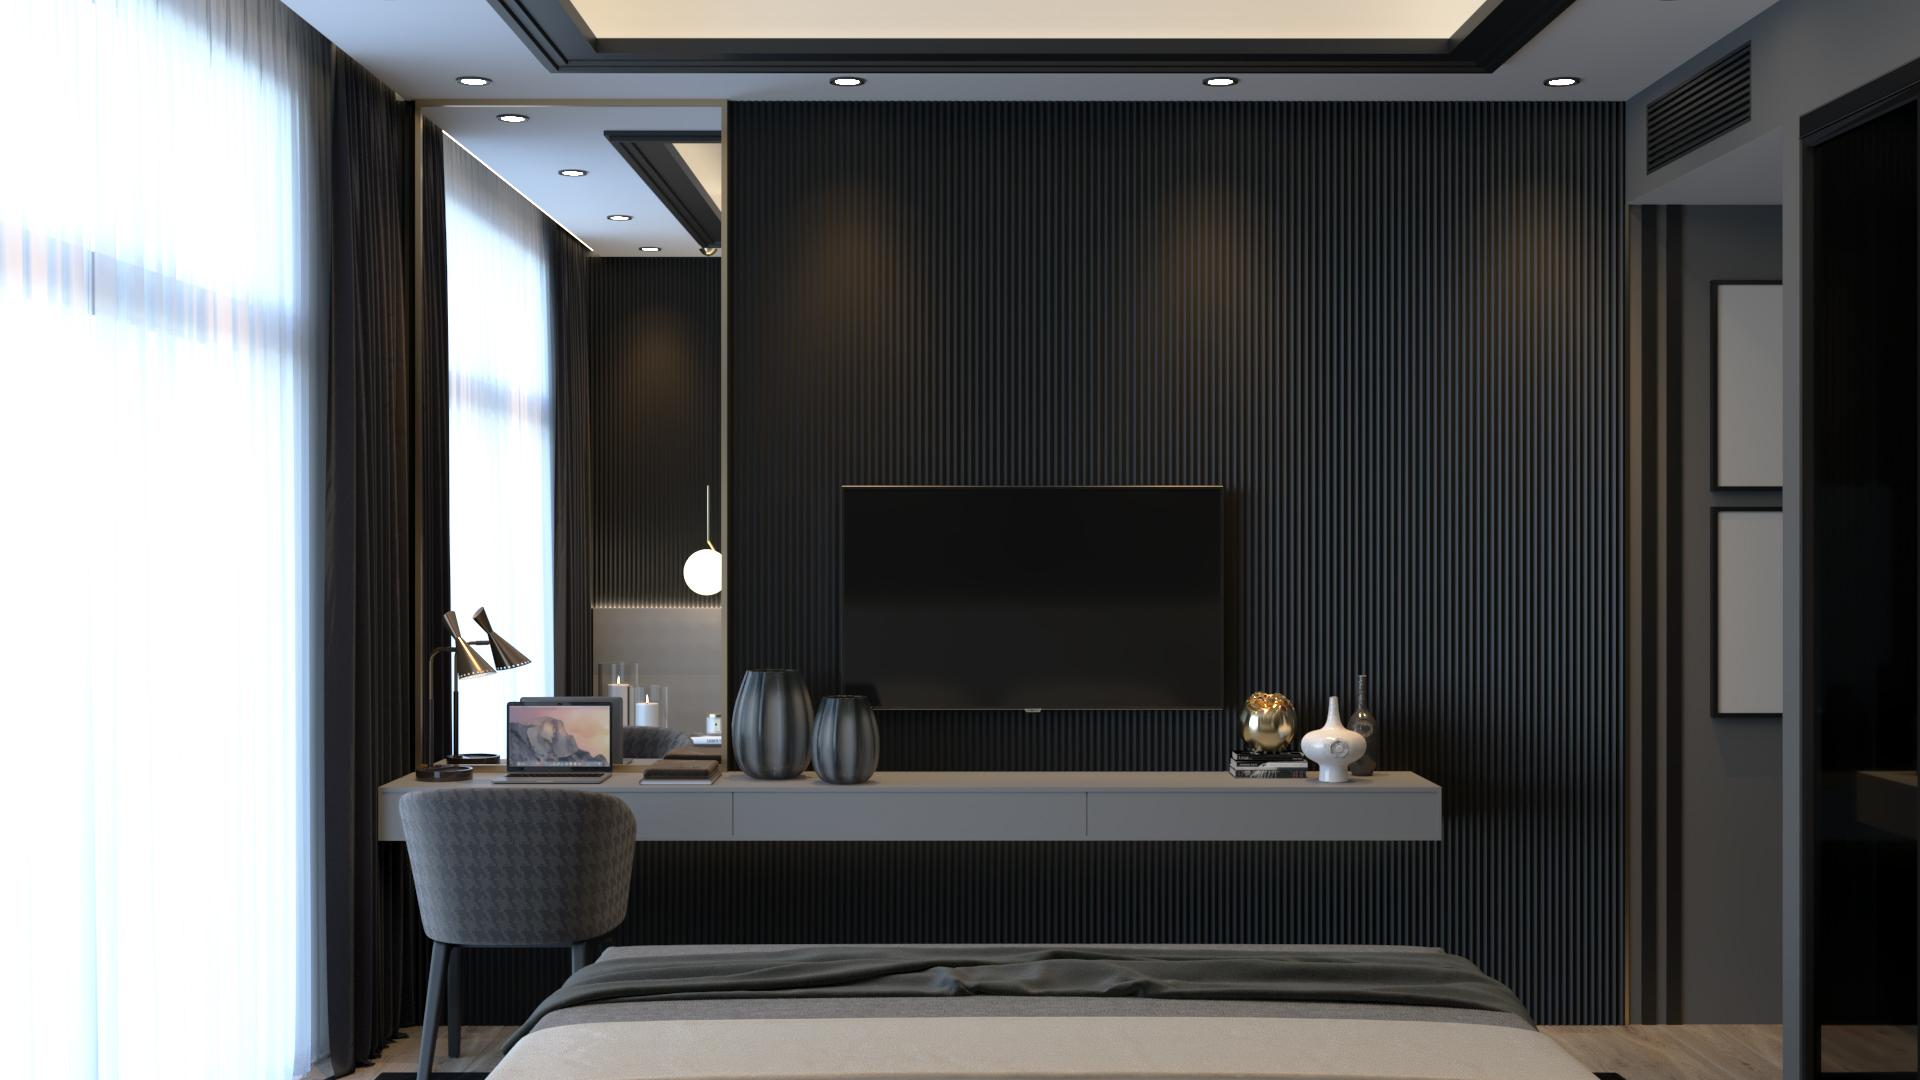 Luxury bedroom 02 total